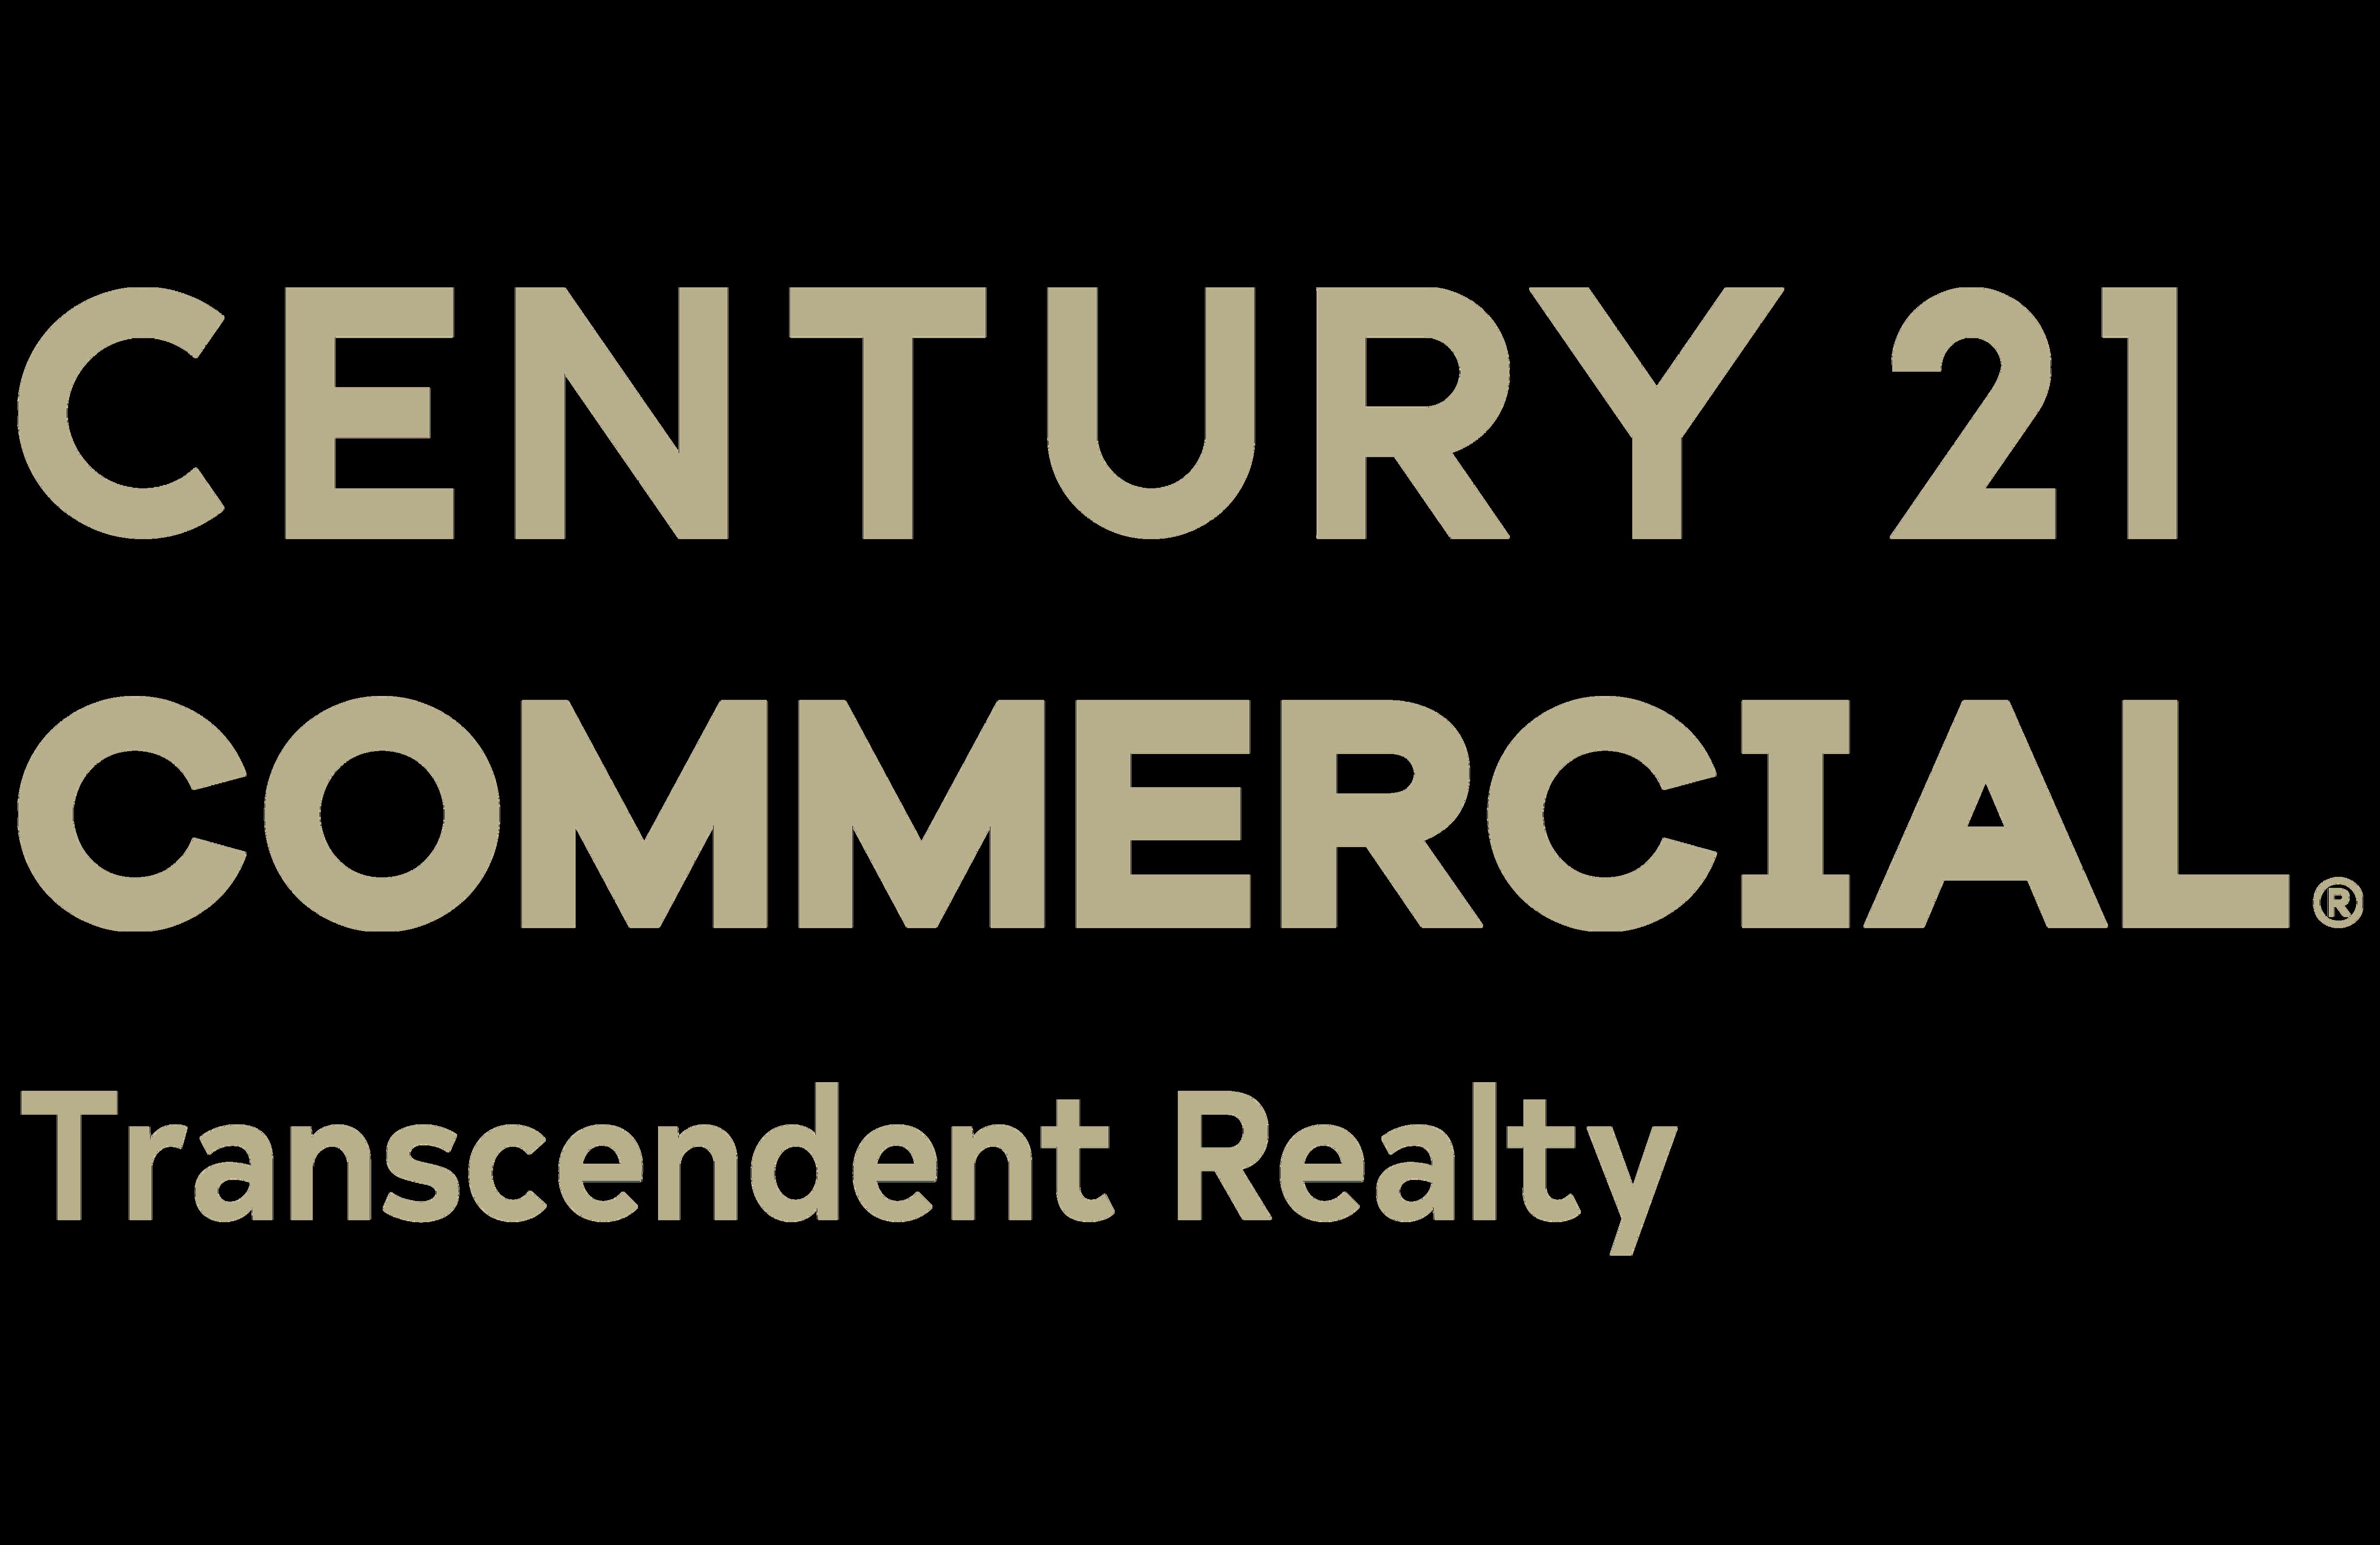 CENTURY 21 Transcendent Realty